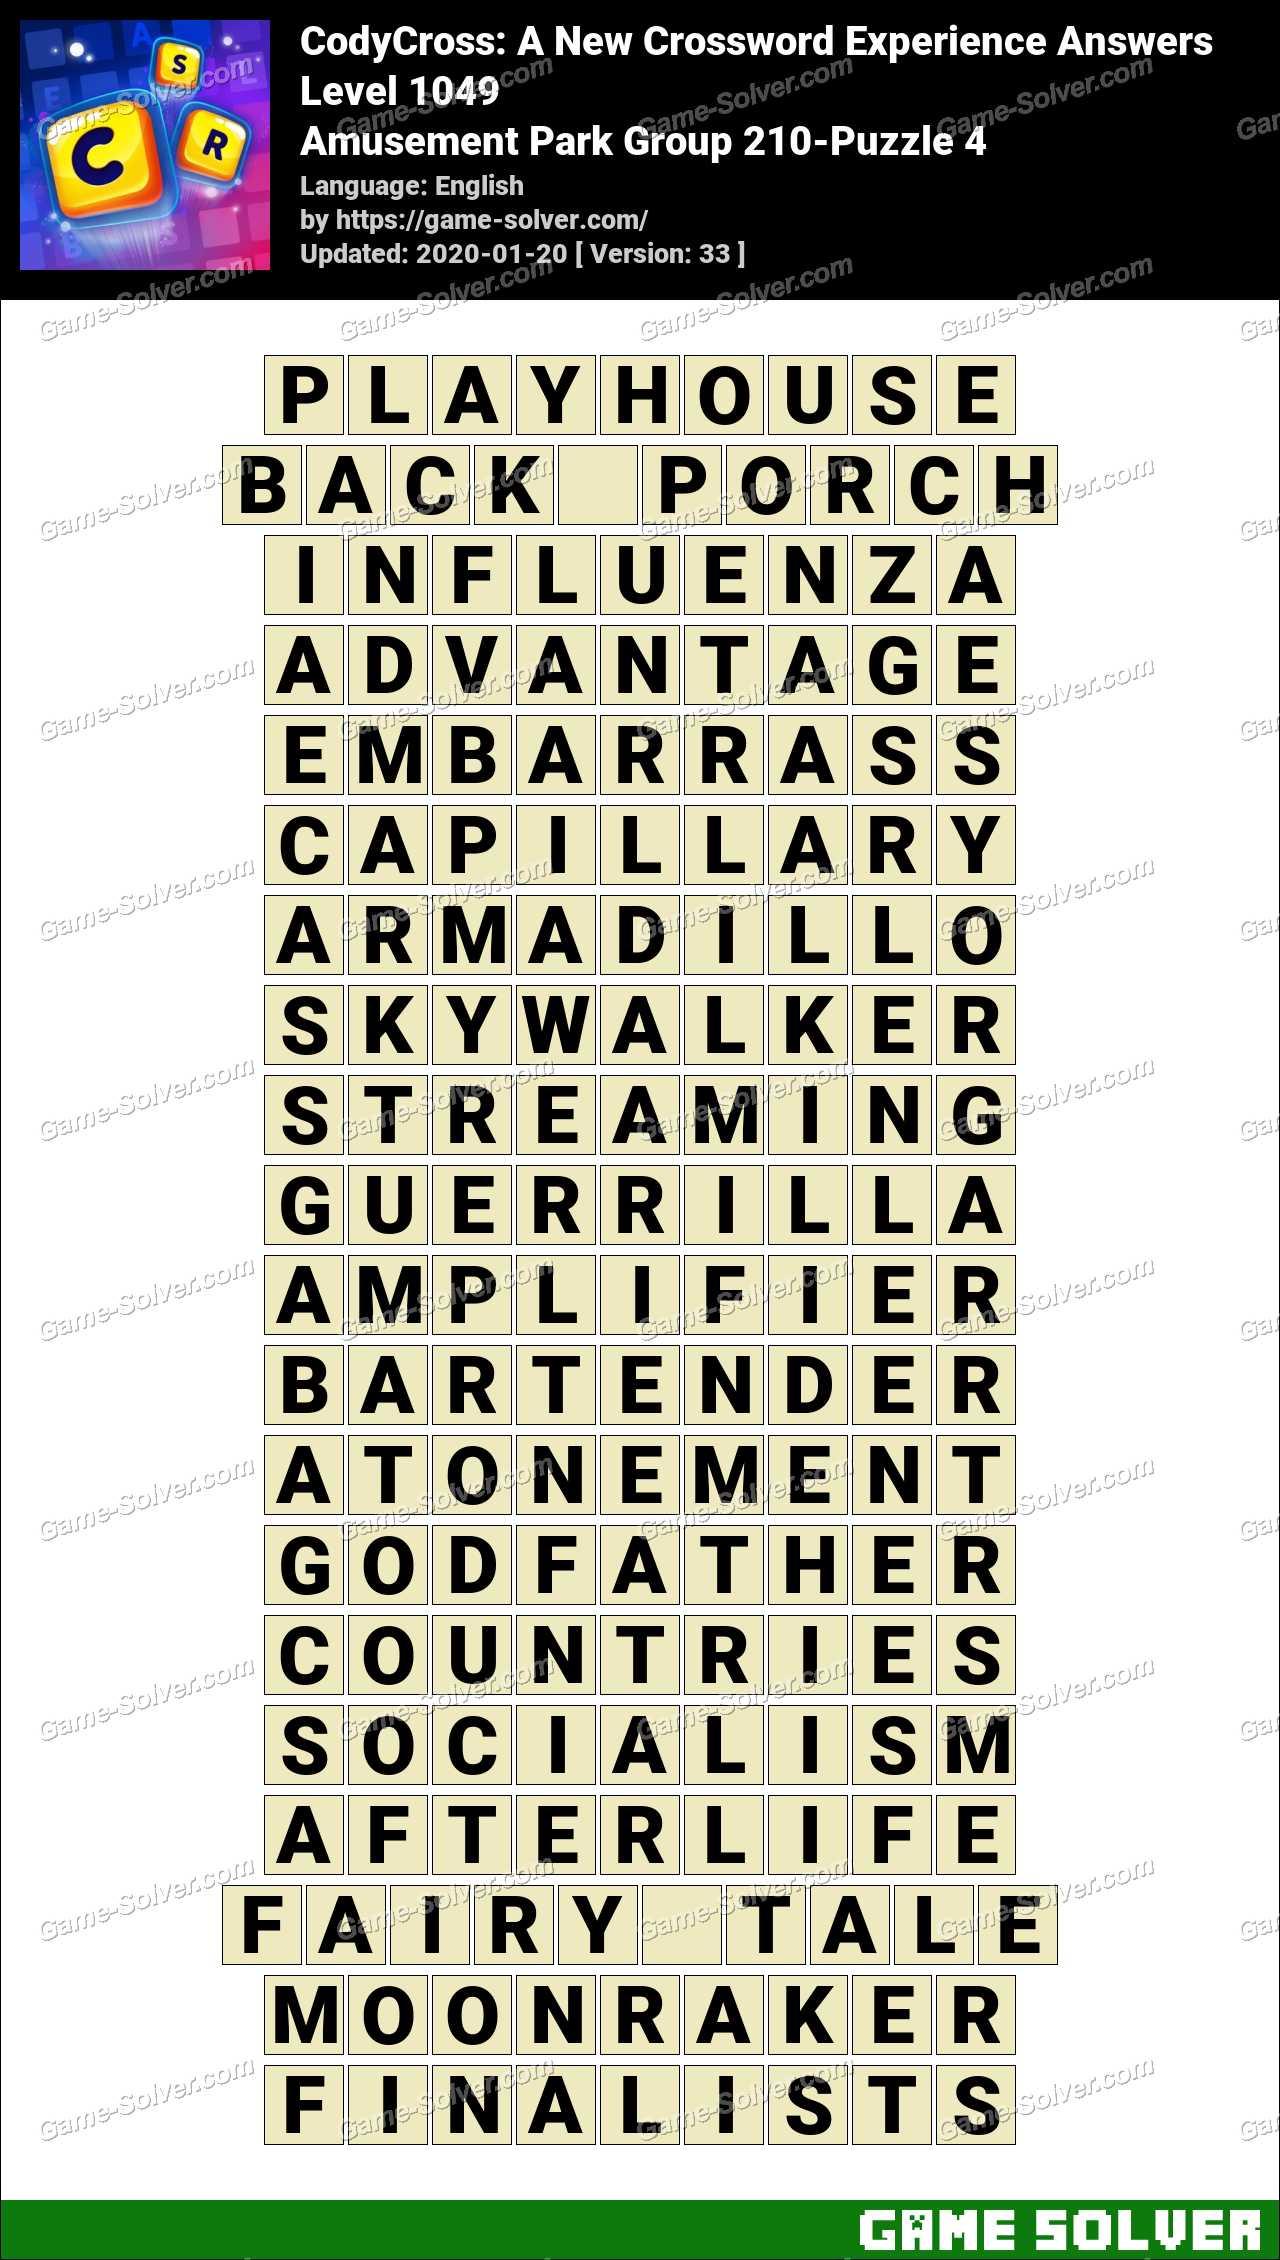 CodyCross Amusement Park Group 210-Puzzle 4 Answers